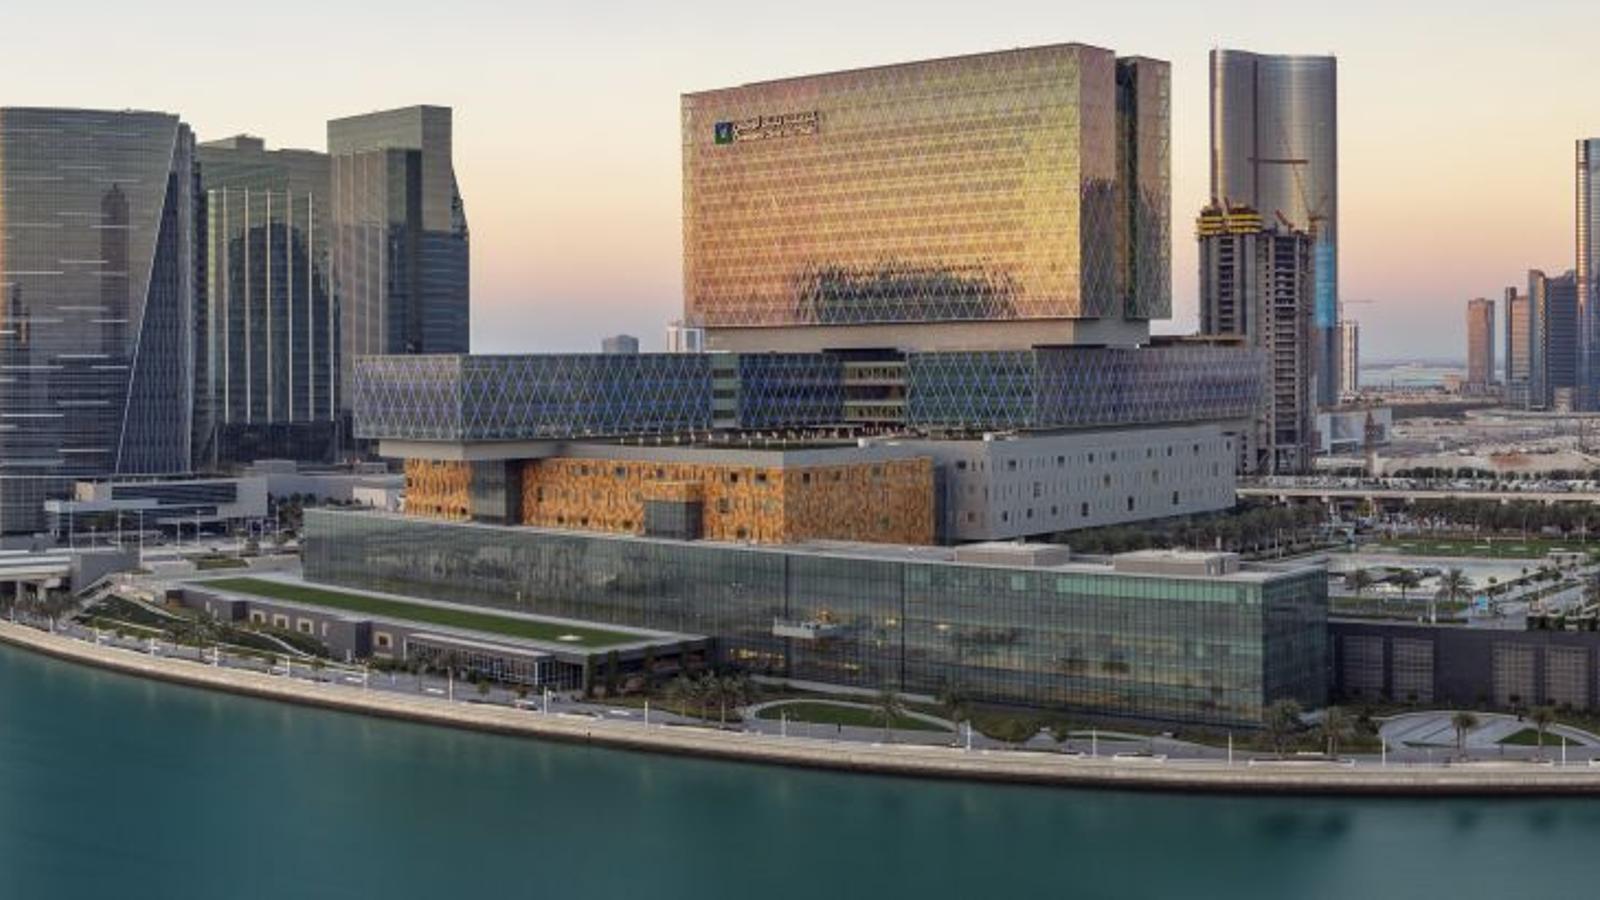 Imatge de la Cleveland Clinic d'Abu Dhabi